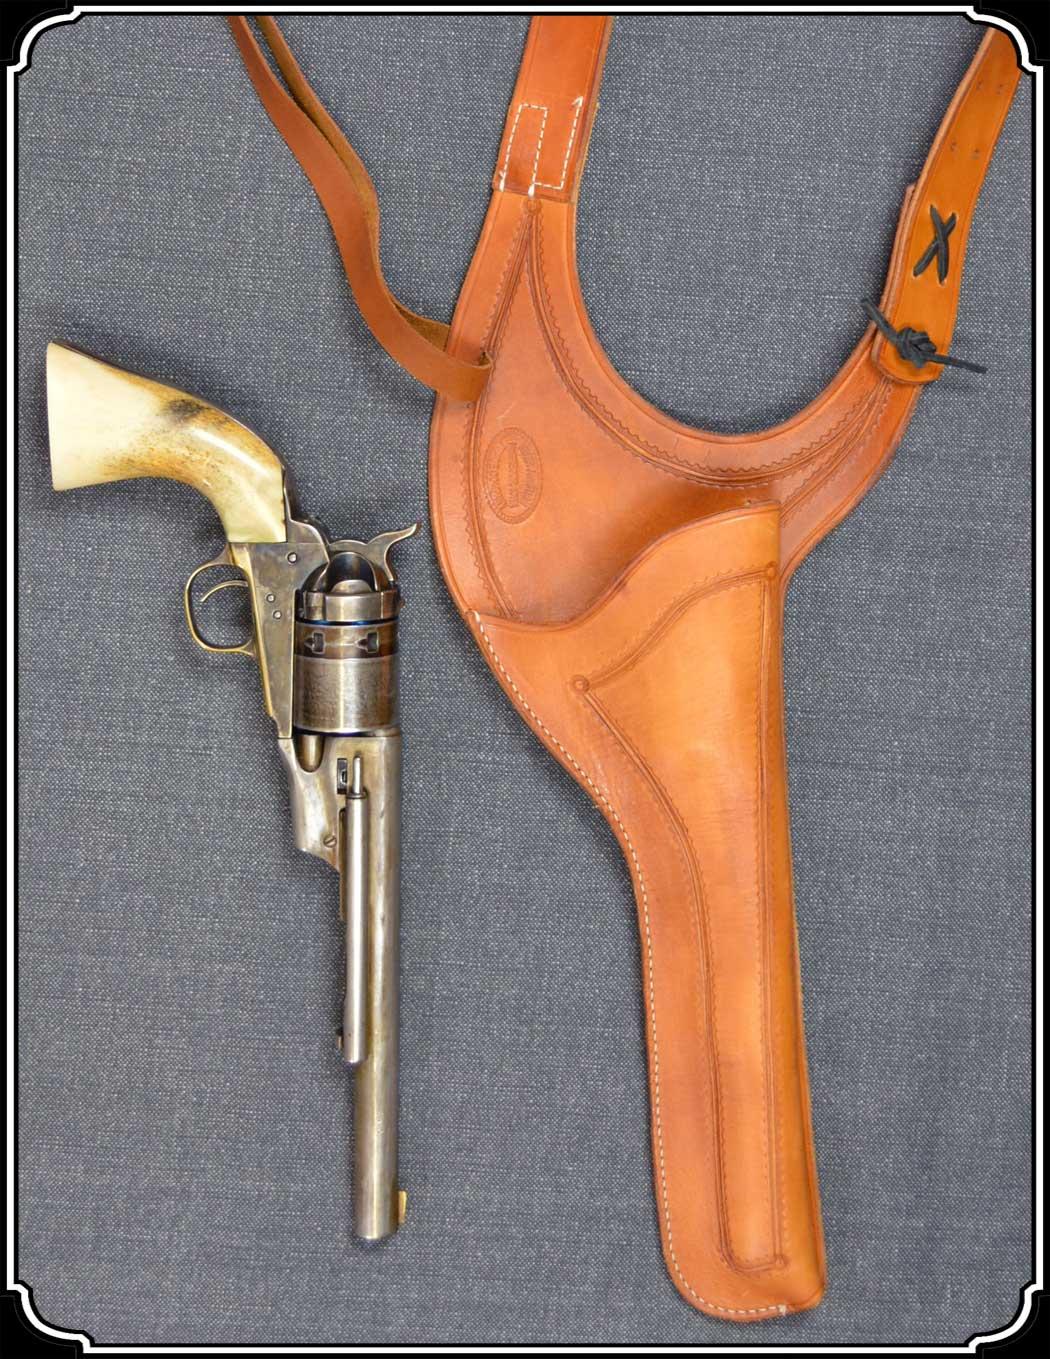 Holster - Texas Shoulder Holster for 7 1/2 and 8 inch Barrel guns